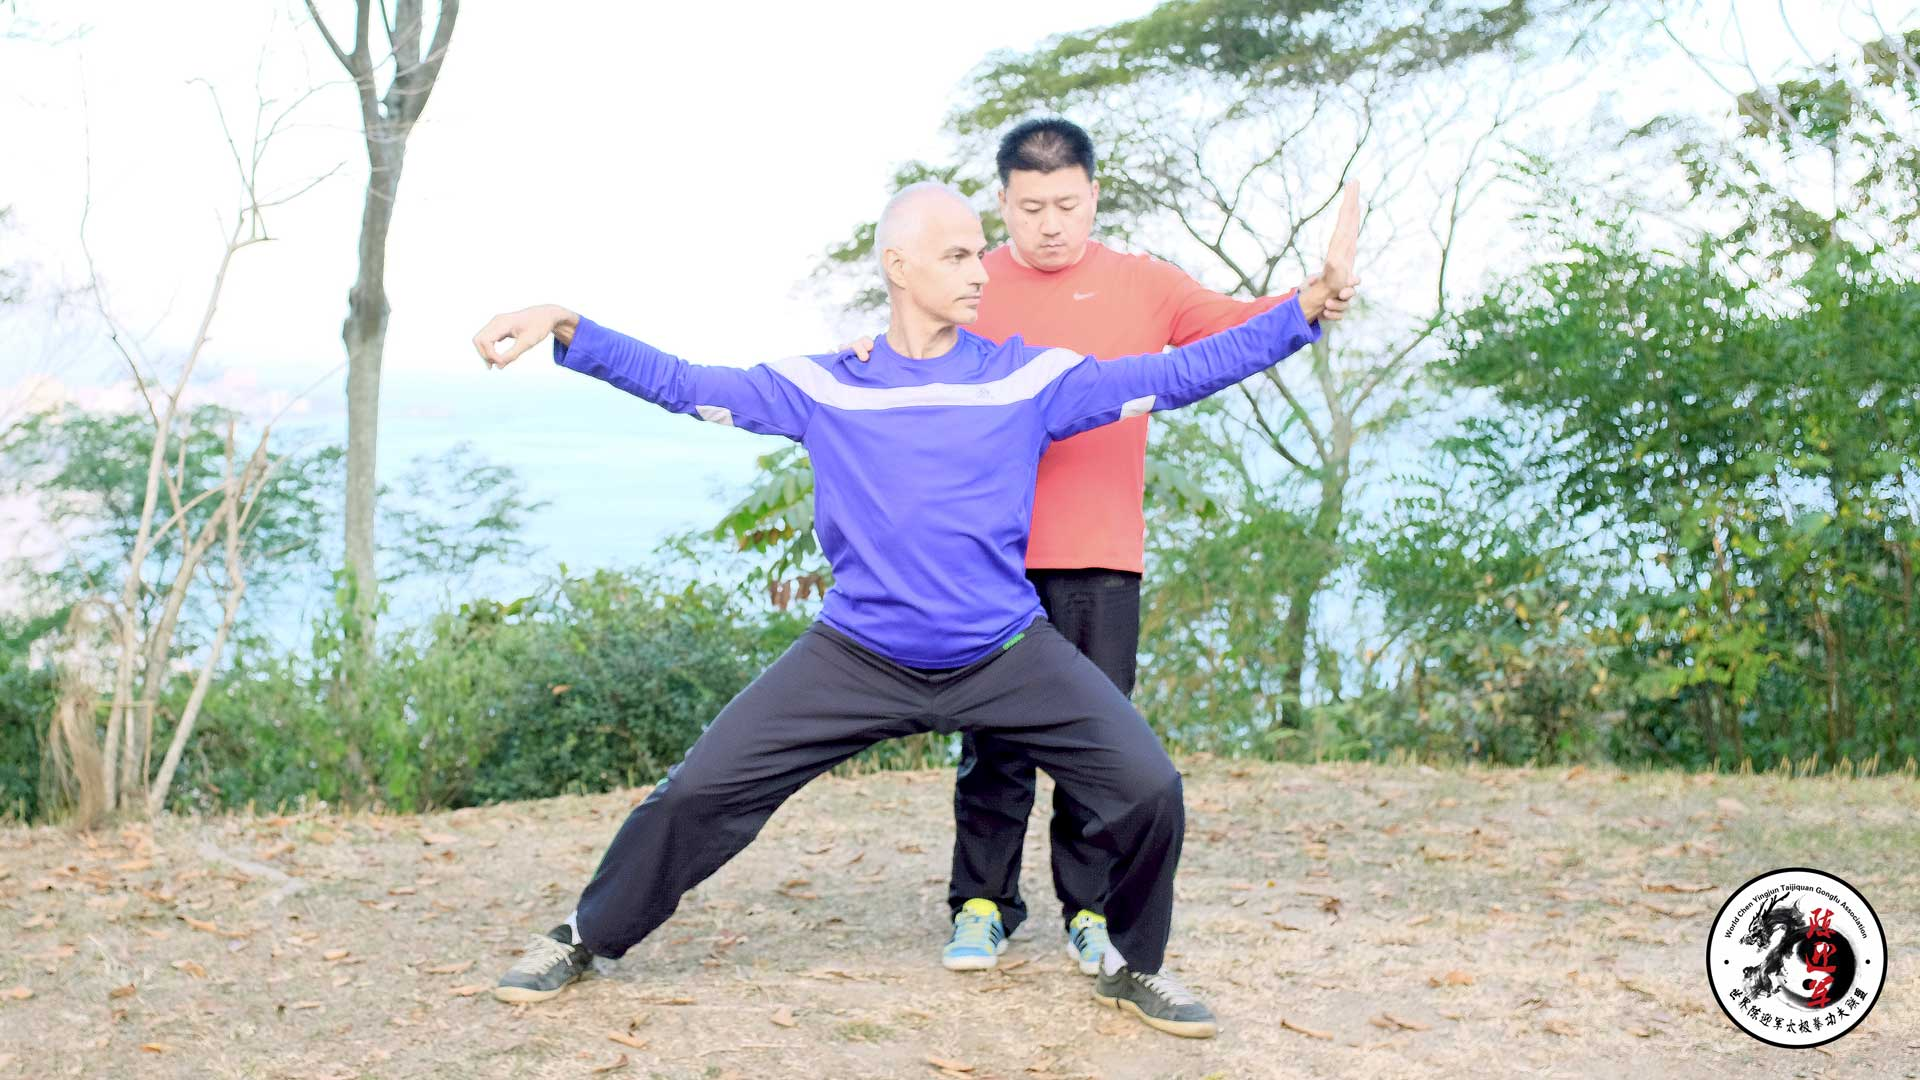 Chen Yingjun and Eduardo Molon